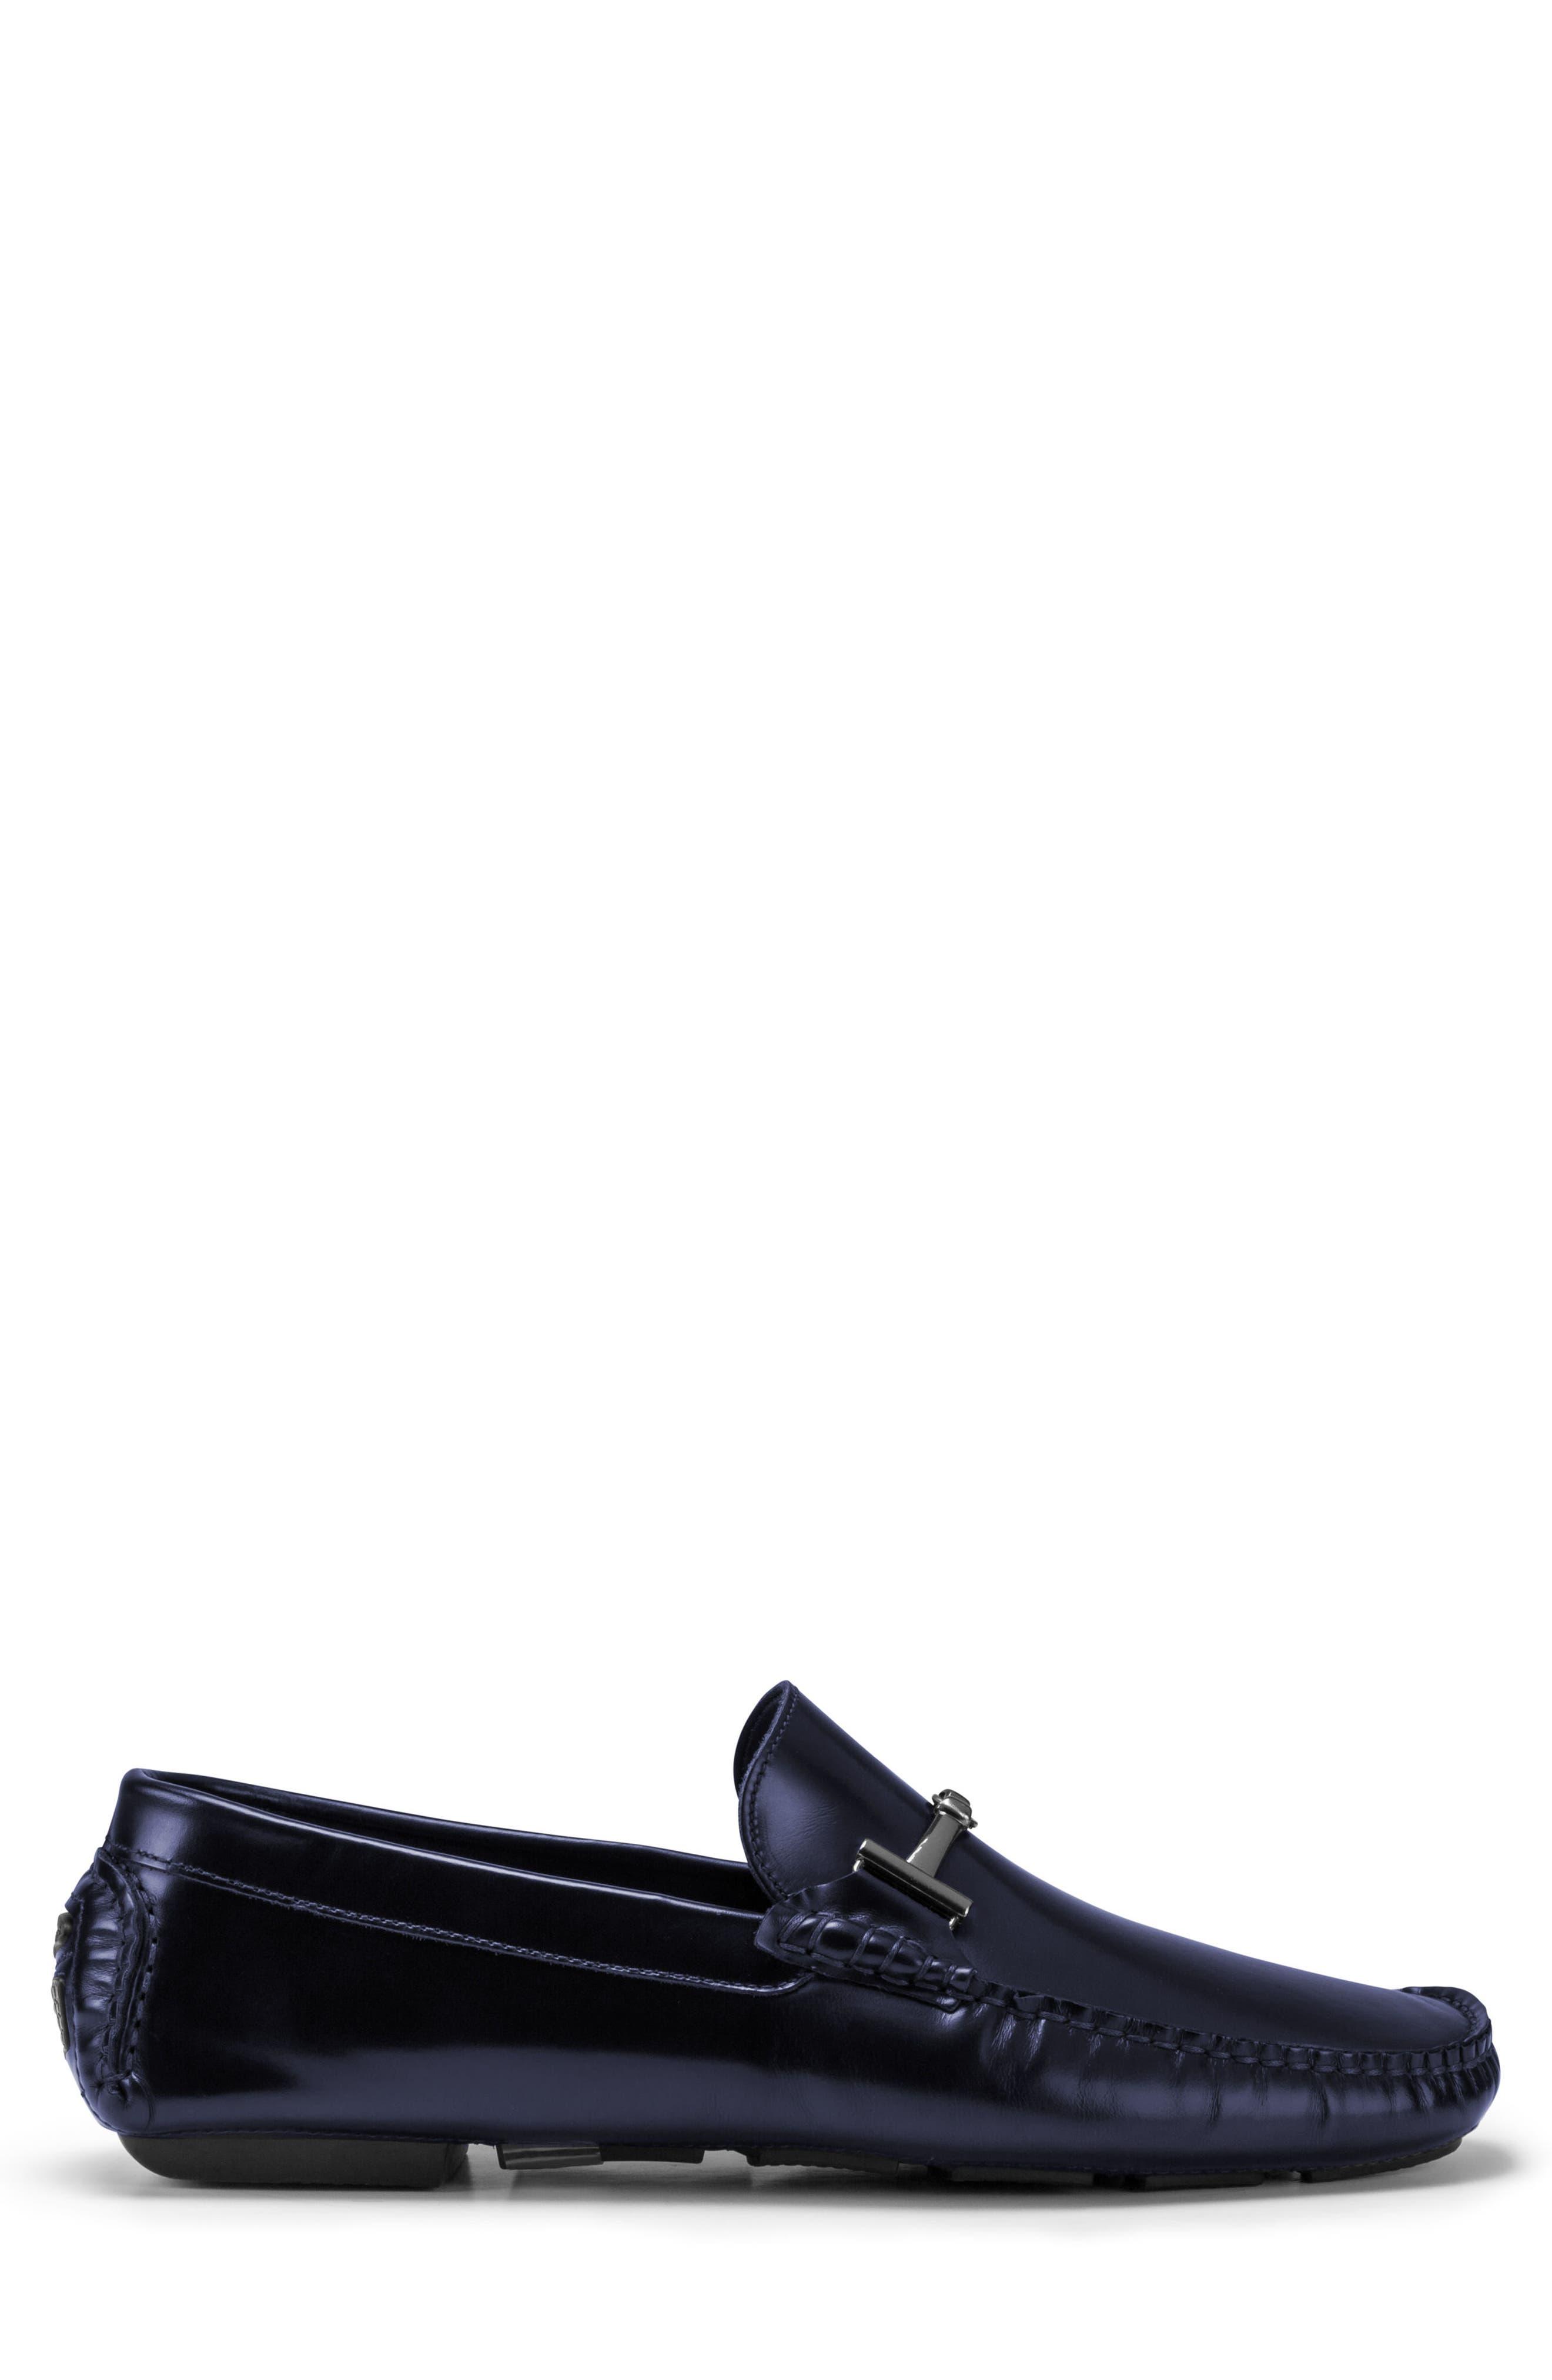 Alternate Image 3  - Bugatchi St. Tropez Driving Shoe (Men)